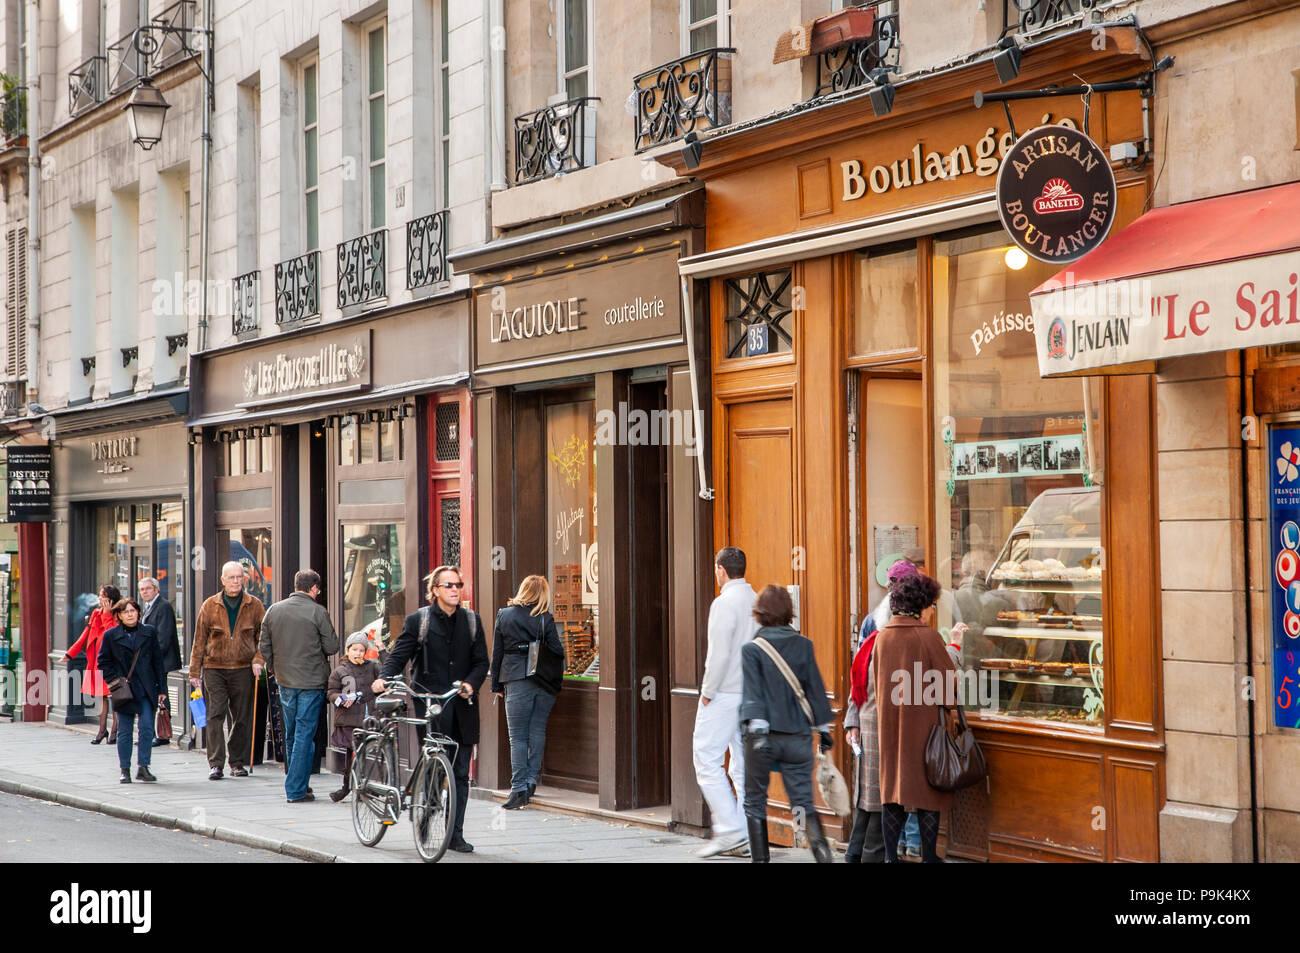 Row of small shops on the Rue des Deux Ponts on the Ile Saint-Louis, Paris, France - Stock Image